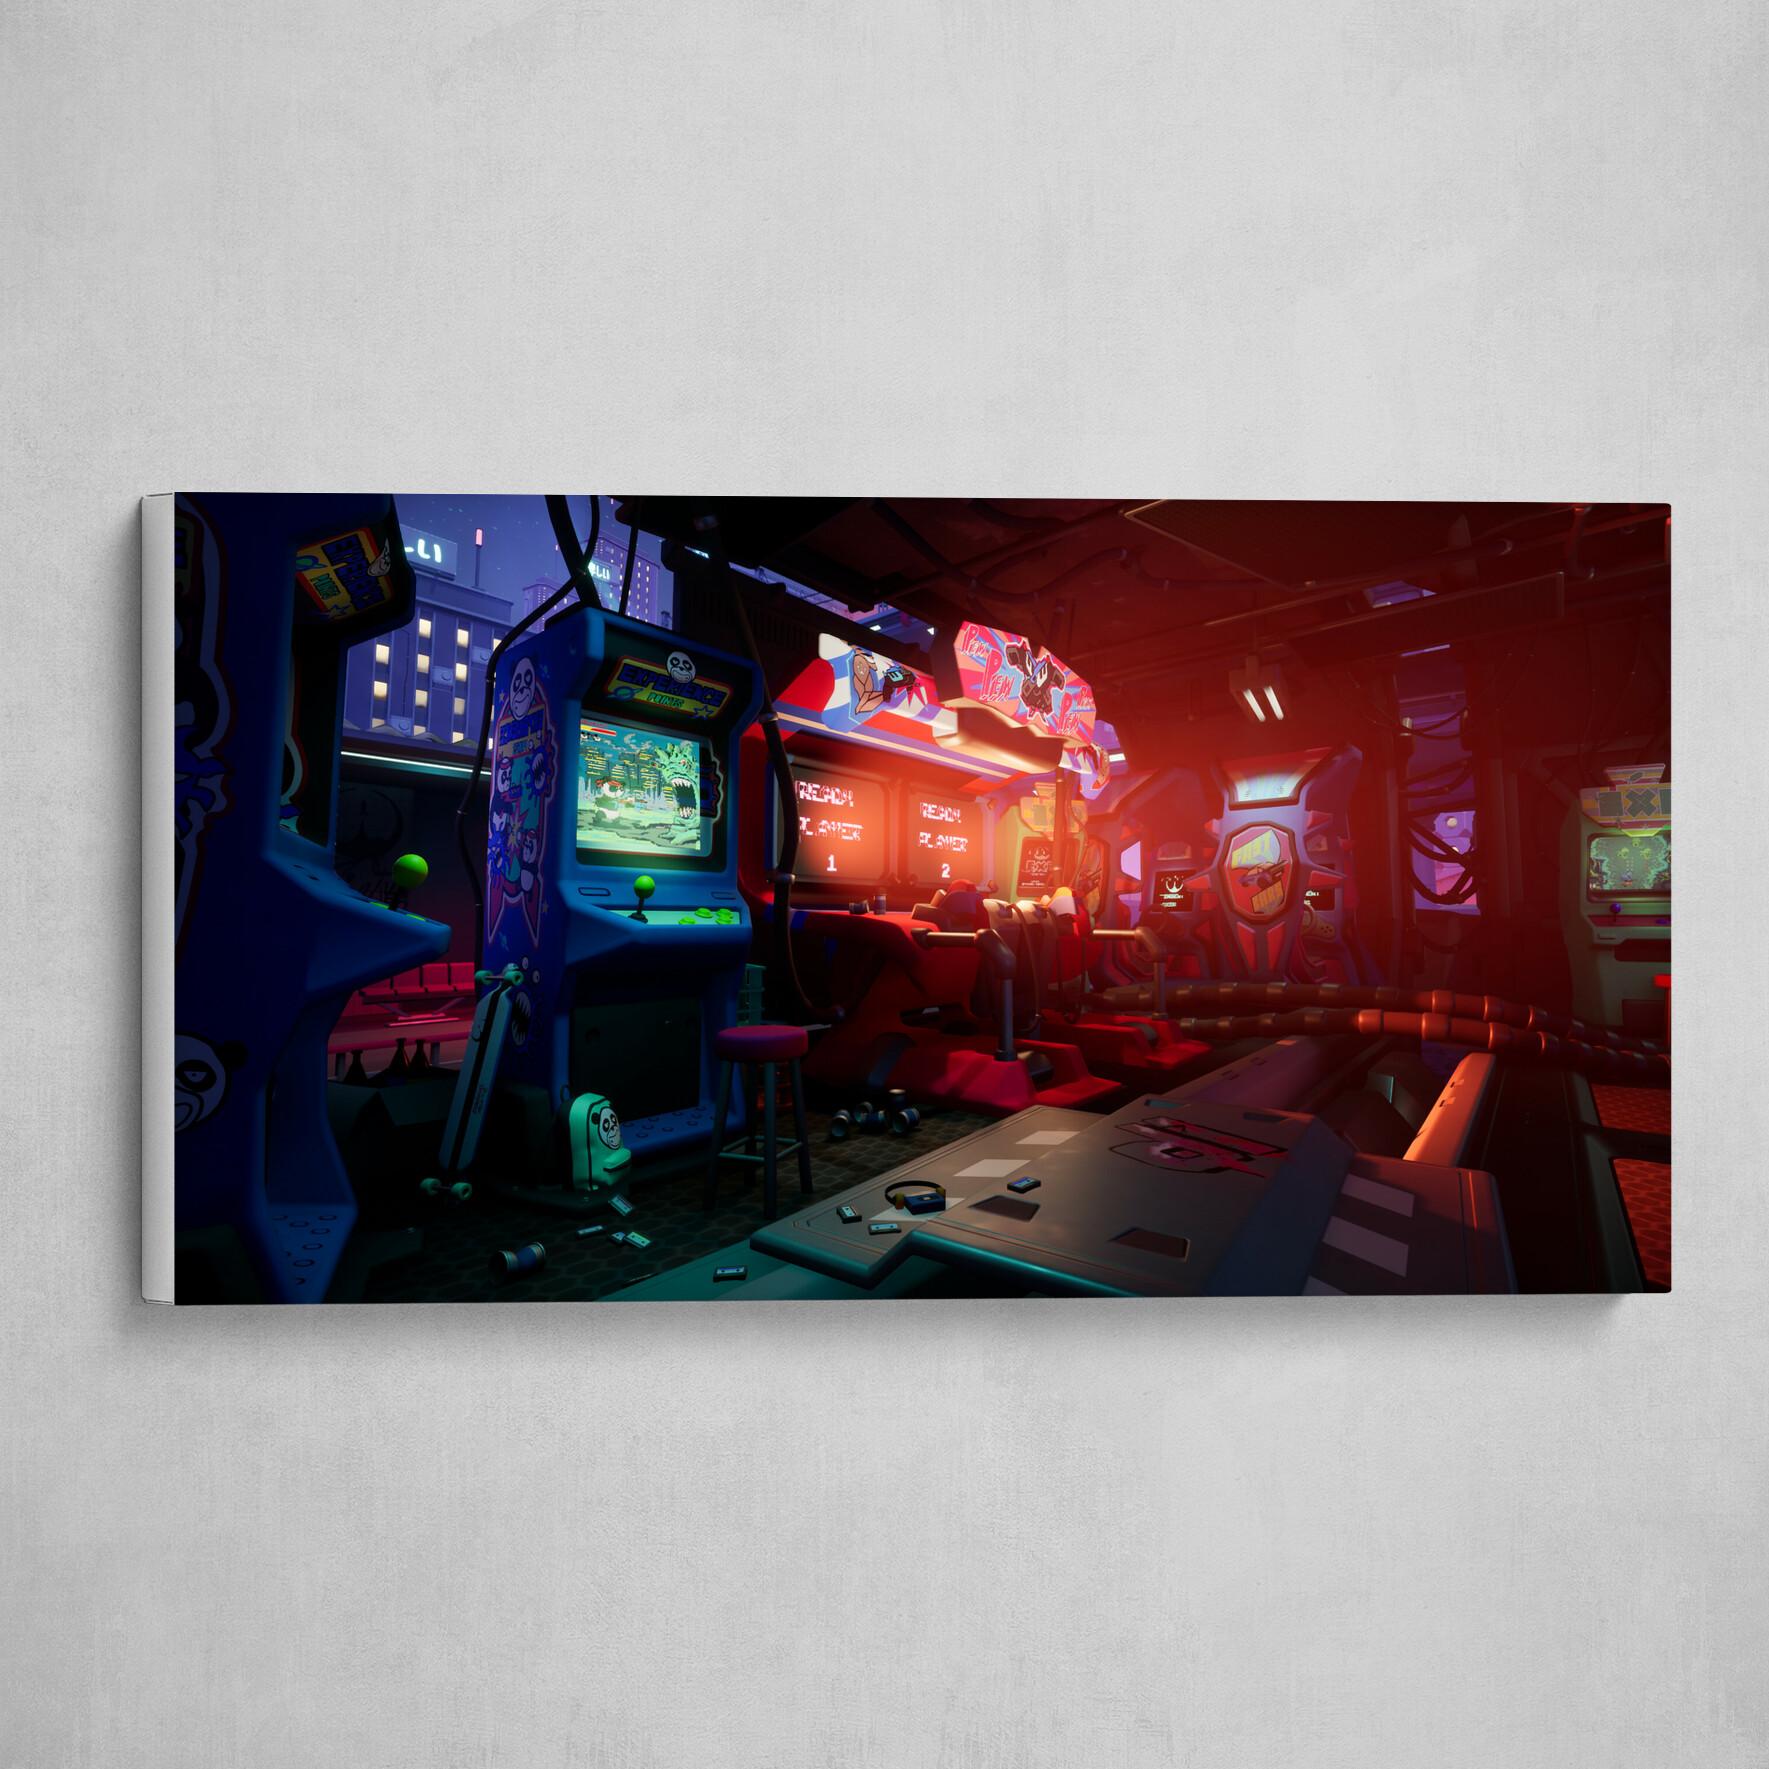 Cyberpunk Arcade interior